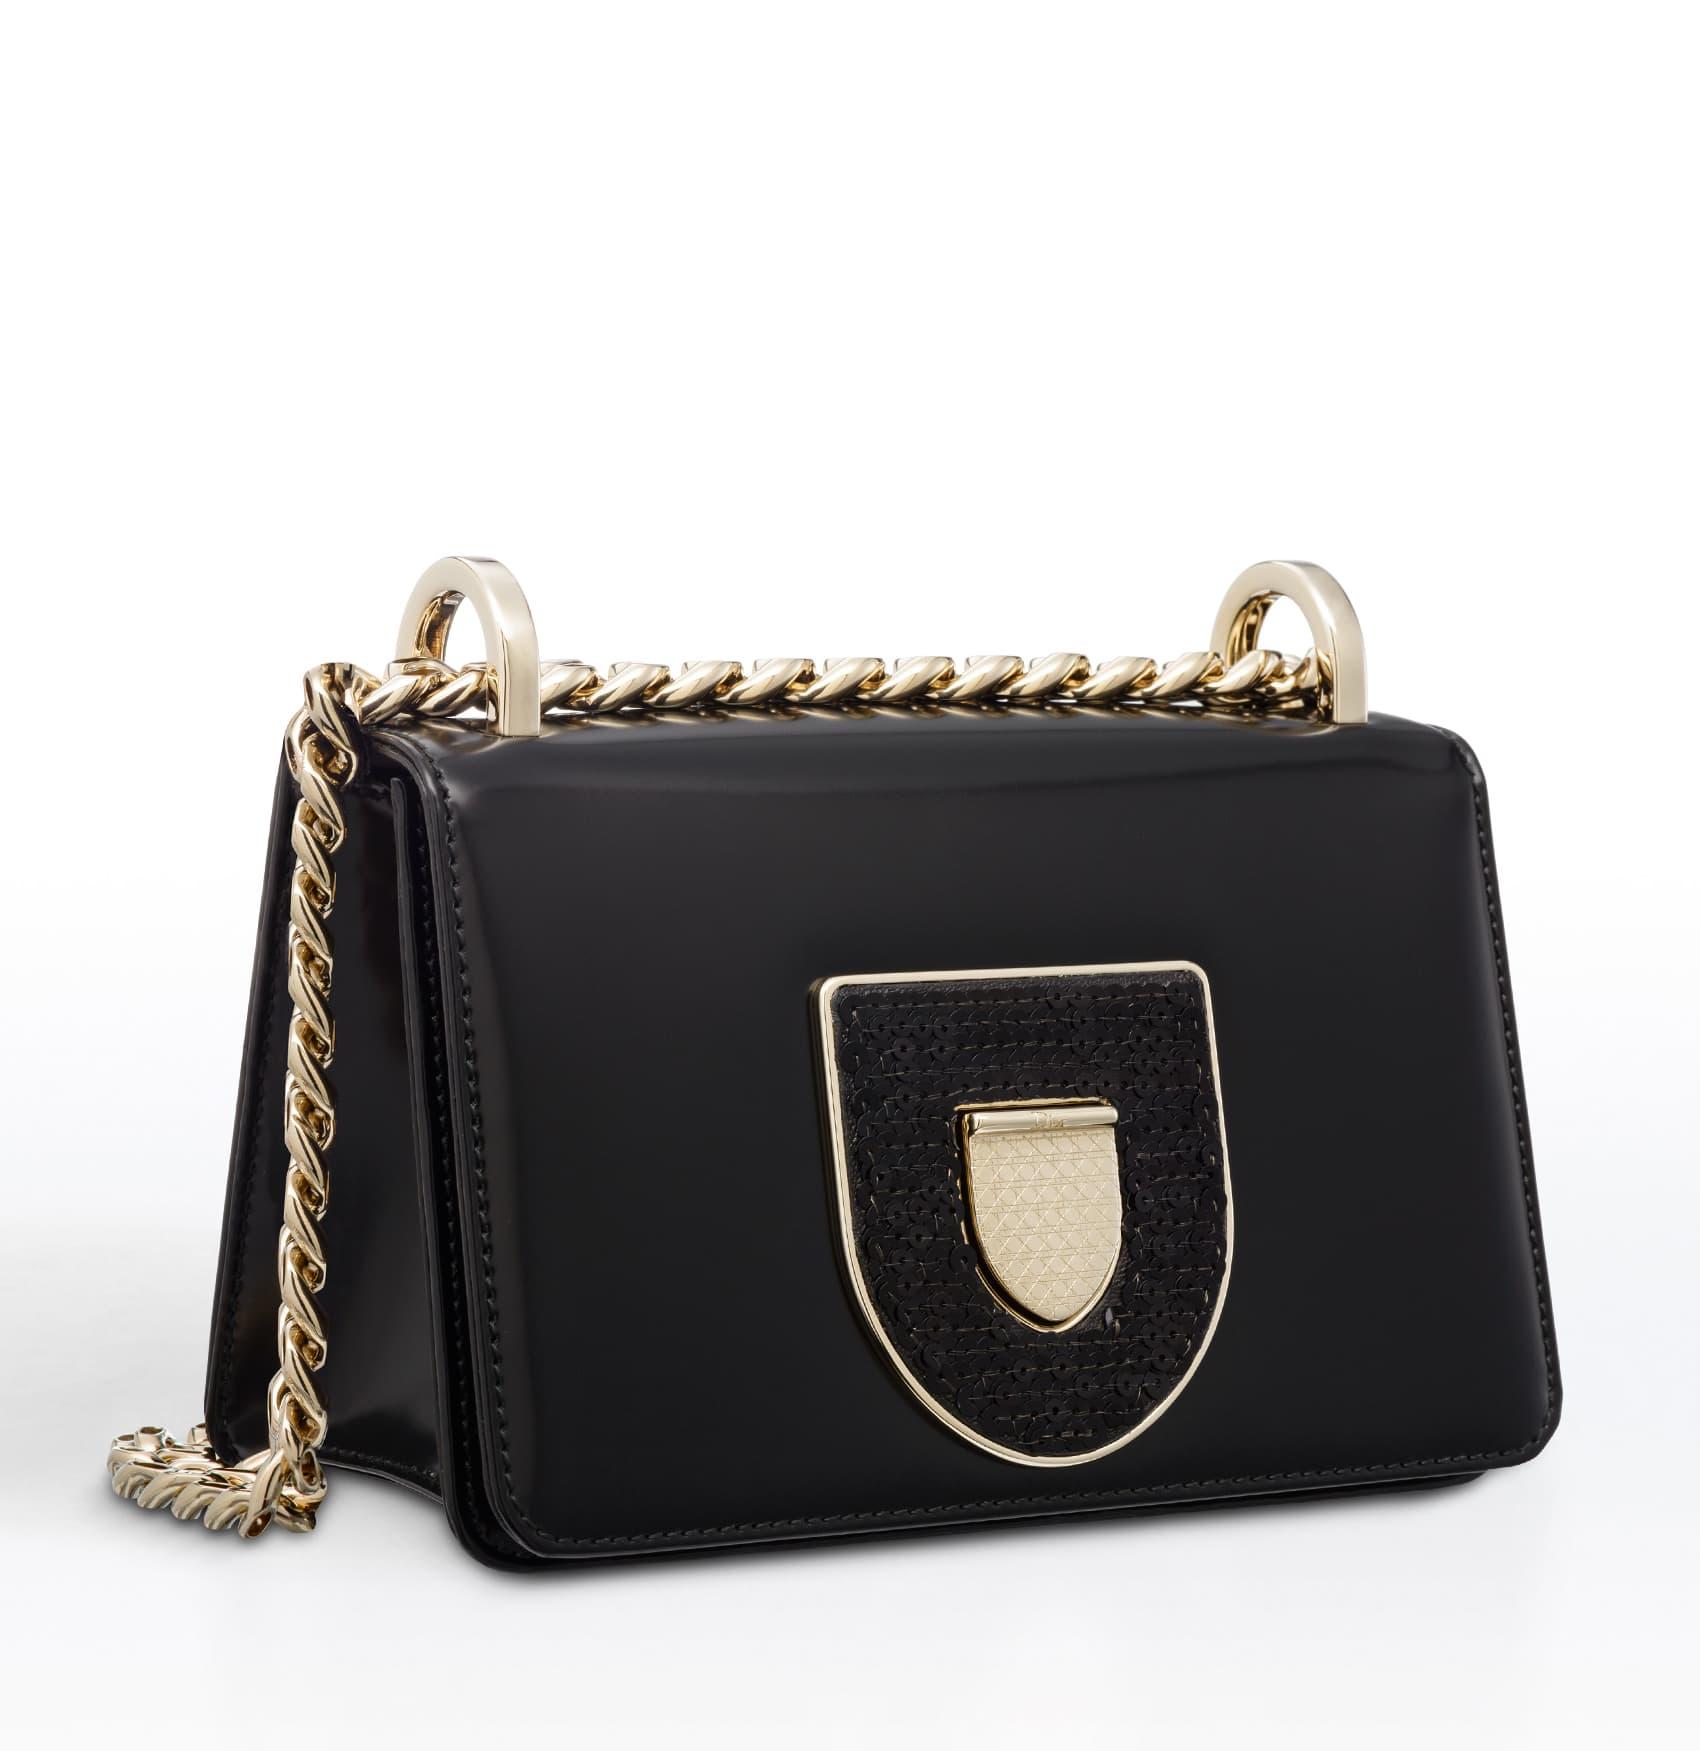 Dior Diorama Club Bag Reference Guide